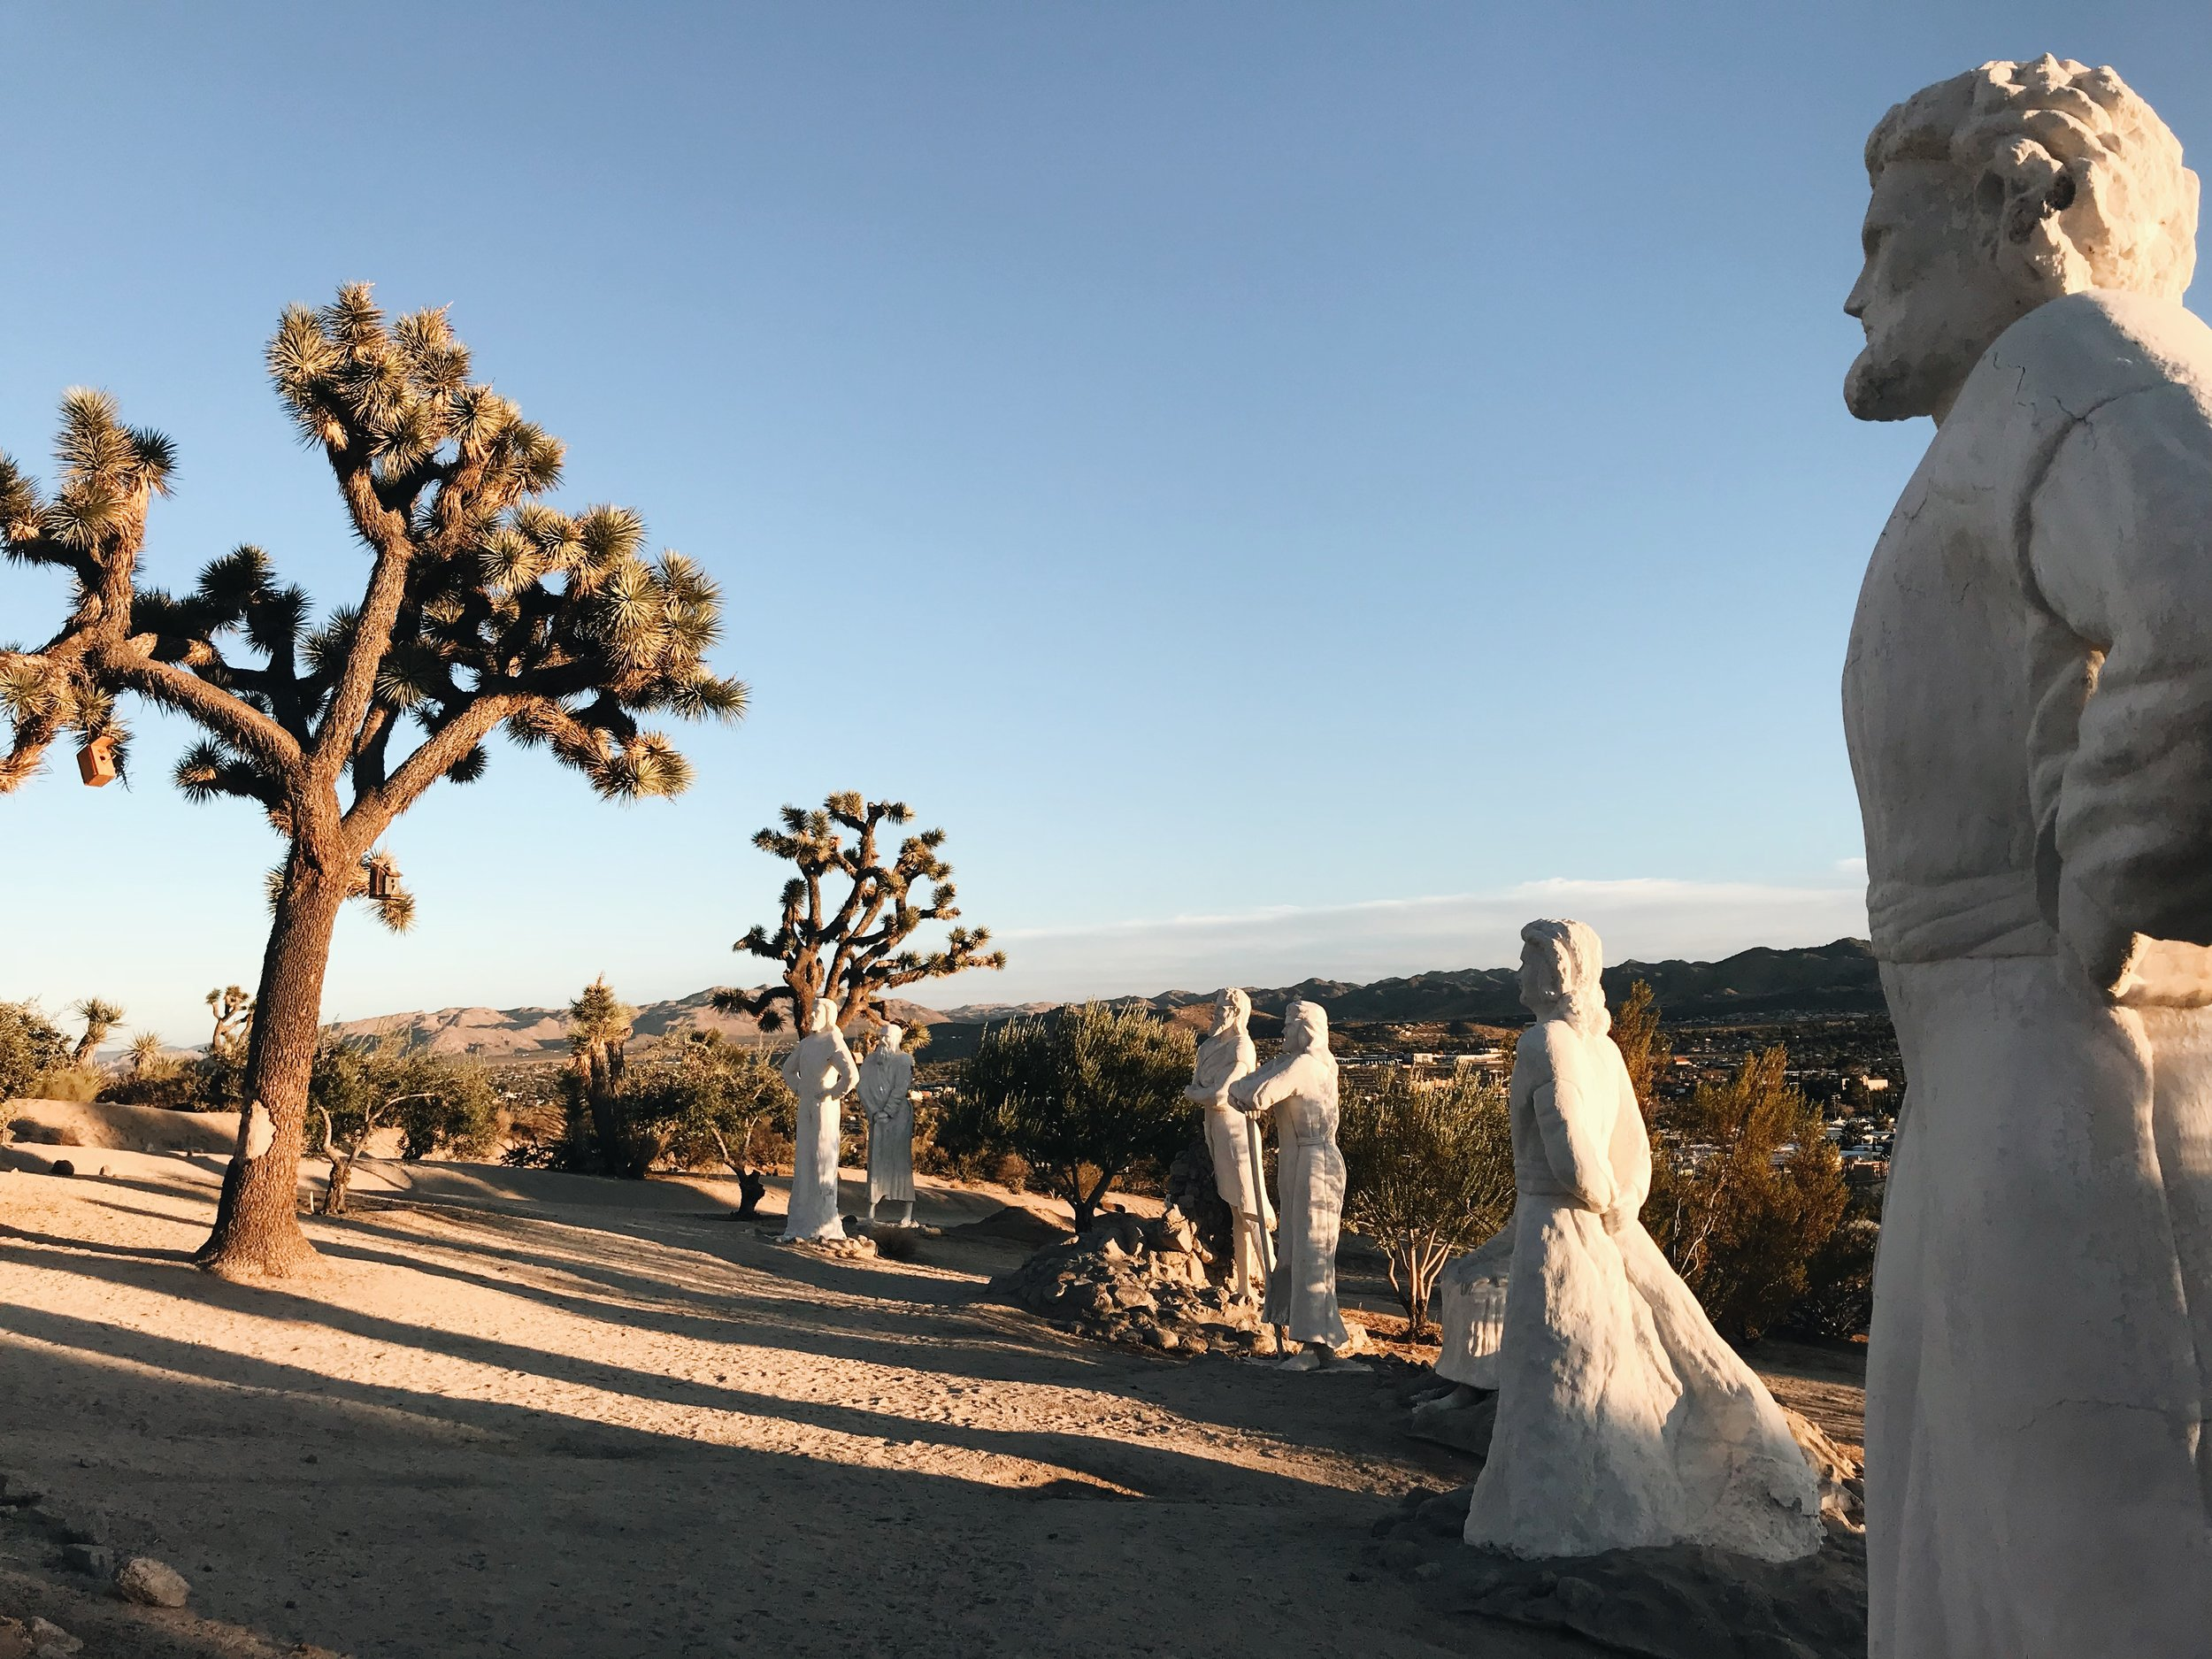 chrissihernandez-california-yuccavalley-desertchristpark (4).JPG